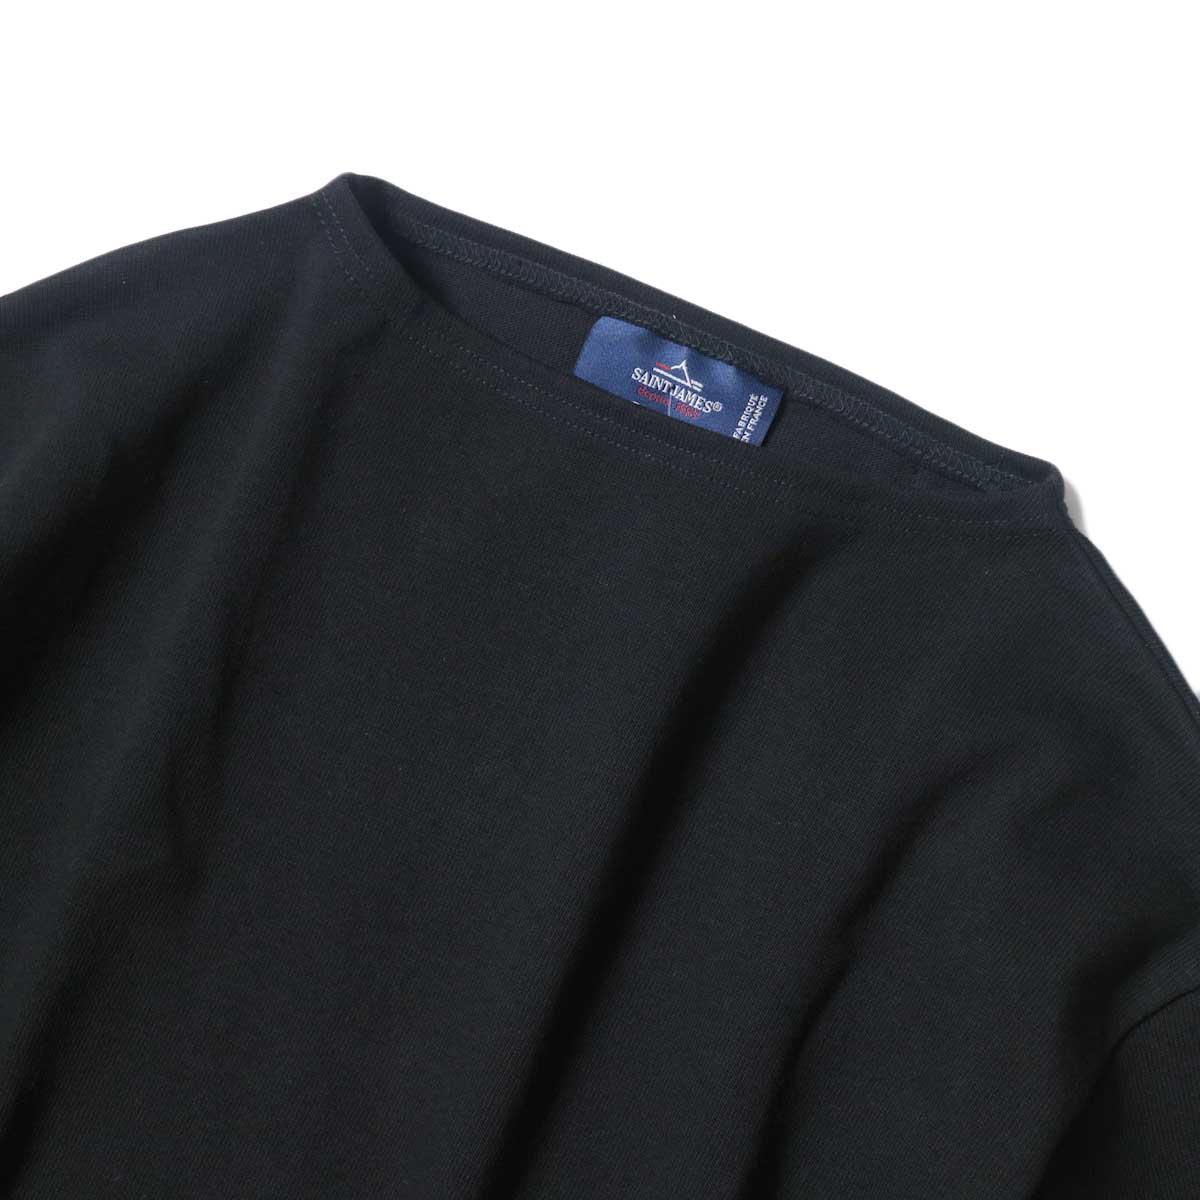 SAINT JAMES / OUESSANT SHORT SLEEVE SHIRTS (Noir) ボートネック